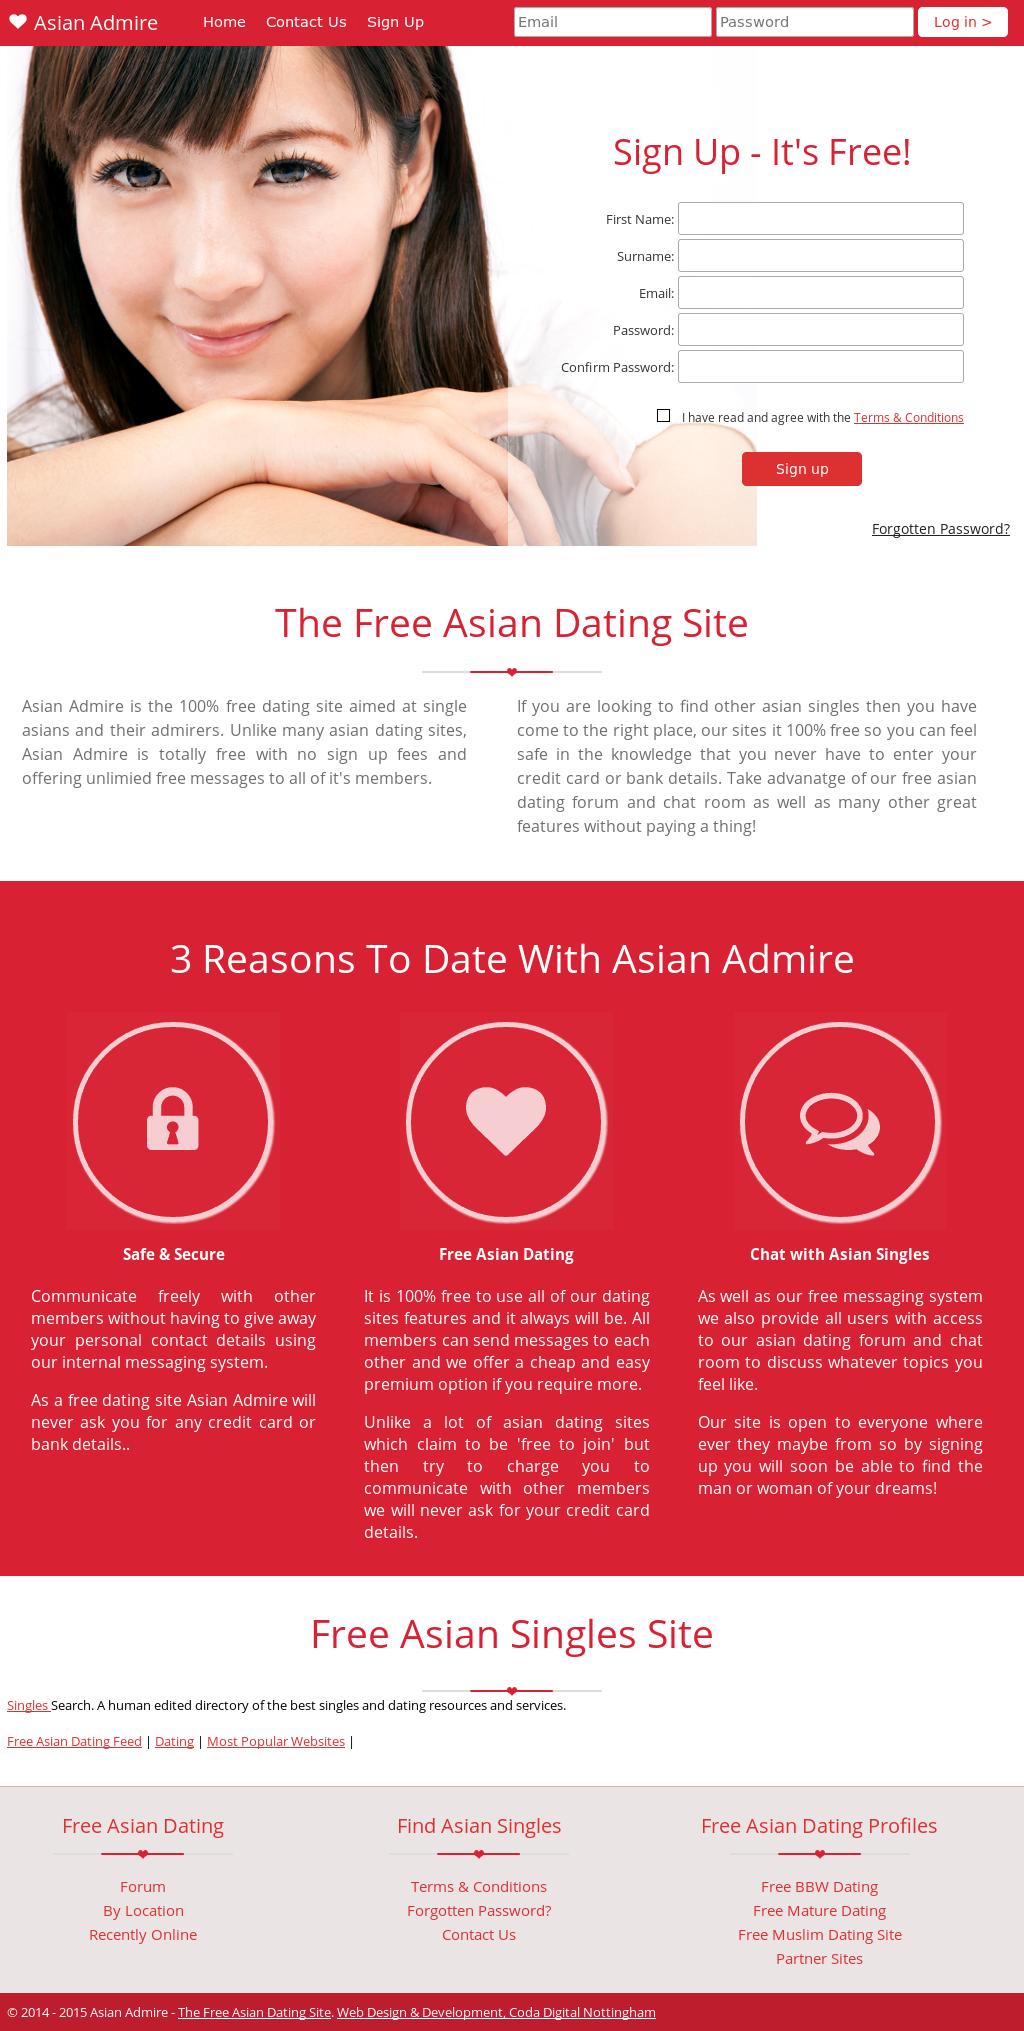 Asian Admire website history